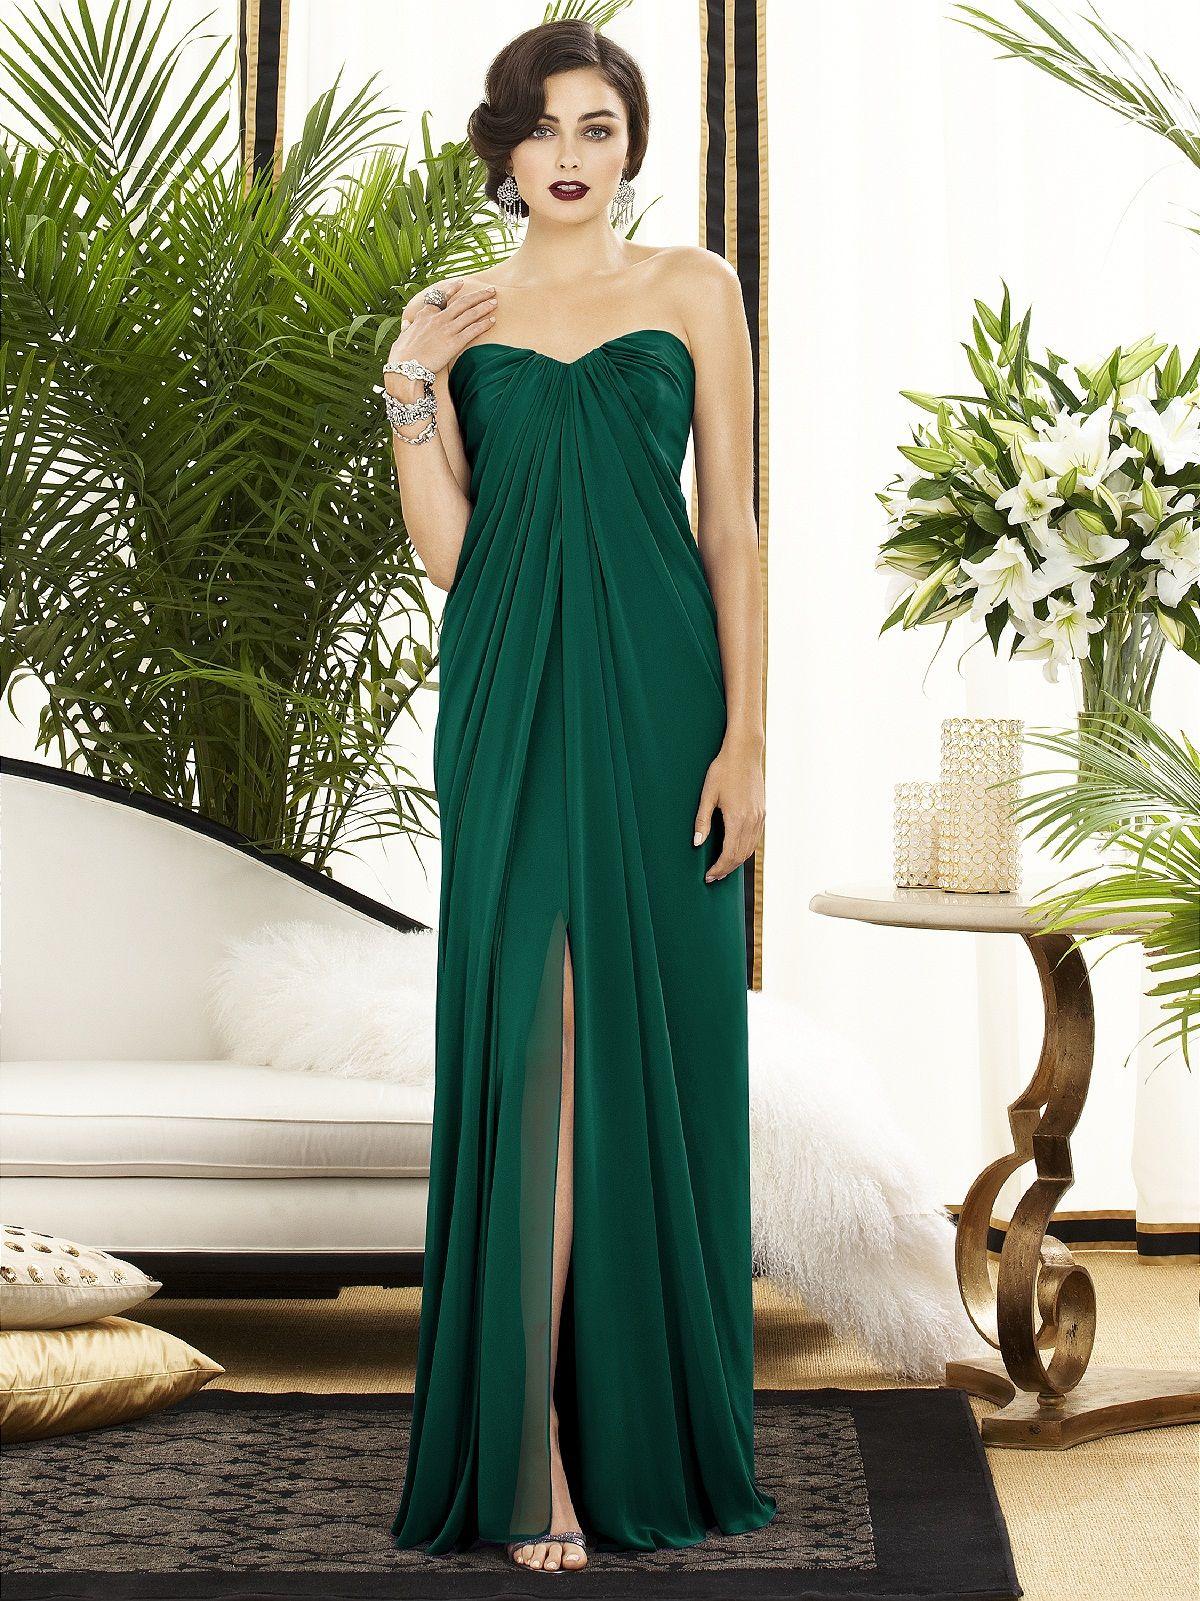 Midi length satin bridesmaid dress satin dresses fashion dessy collection style 2879 green and gold dressemerald green wedding ombrellifo Choice Image